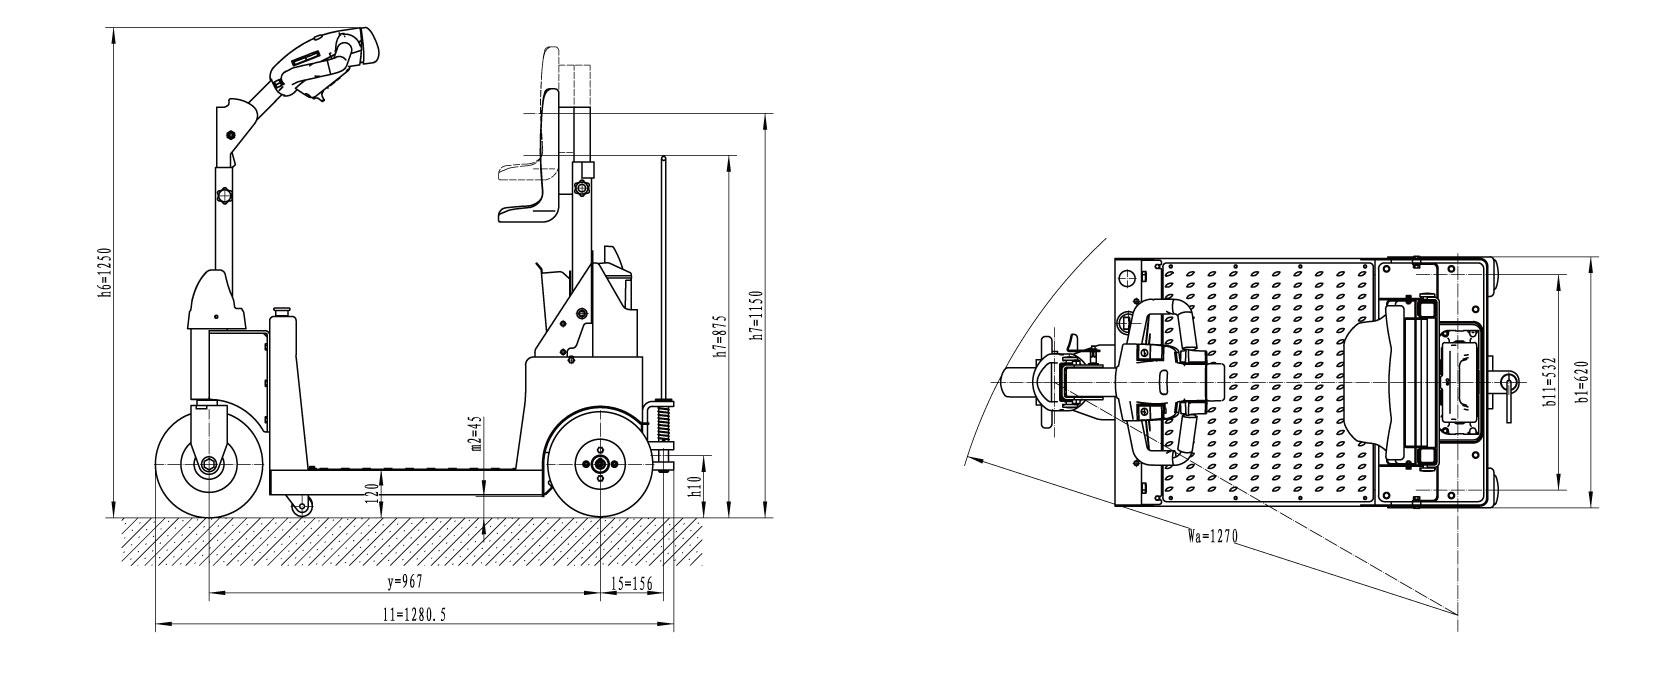 draw.jpg (113 KB)